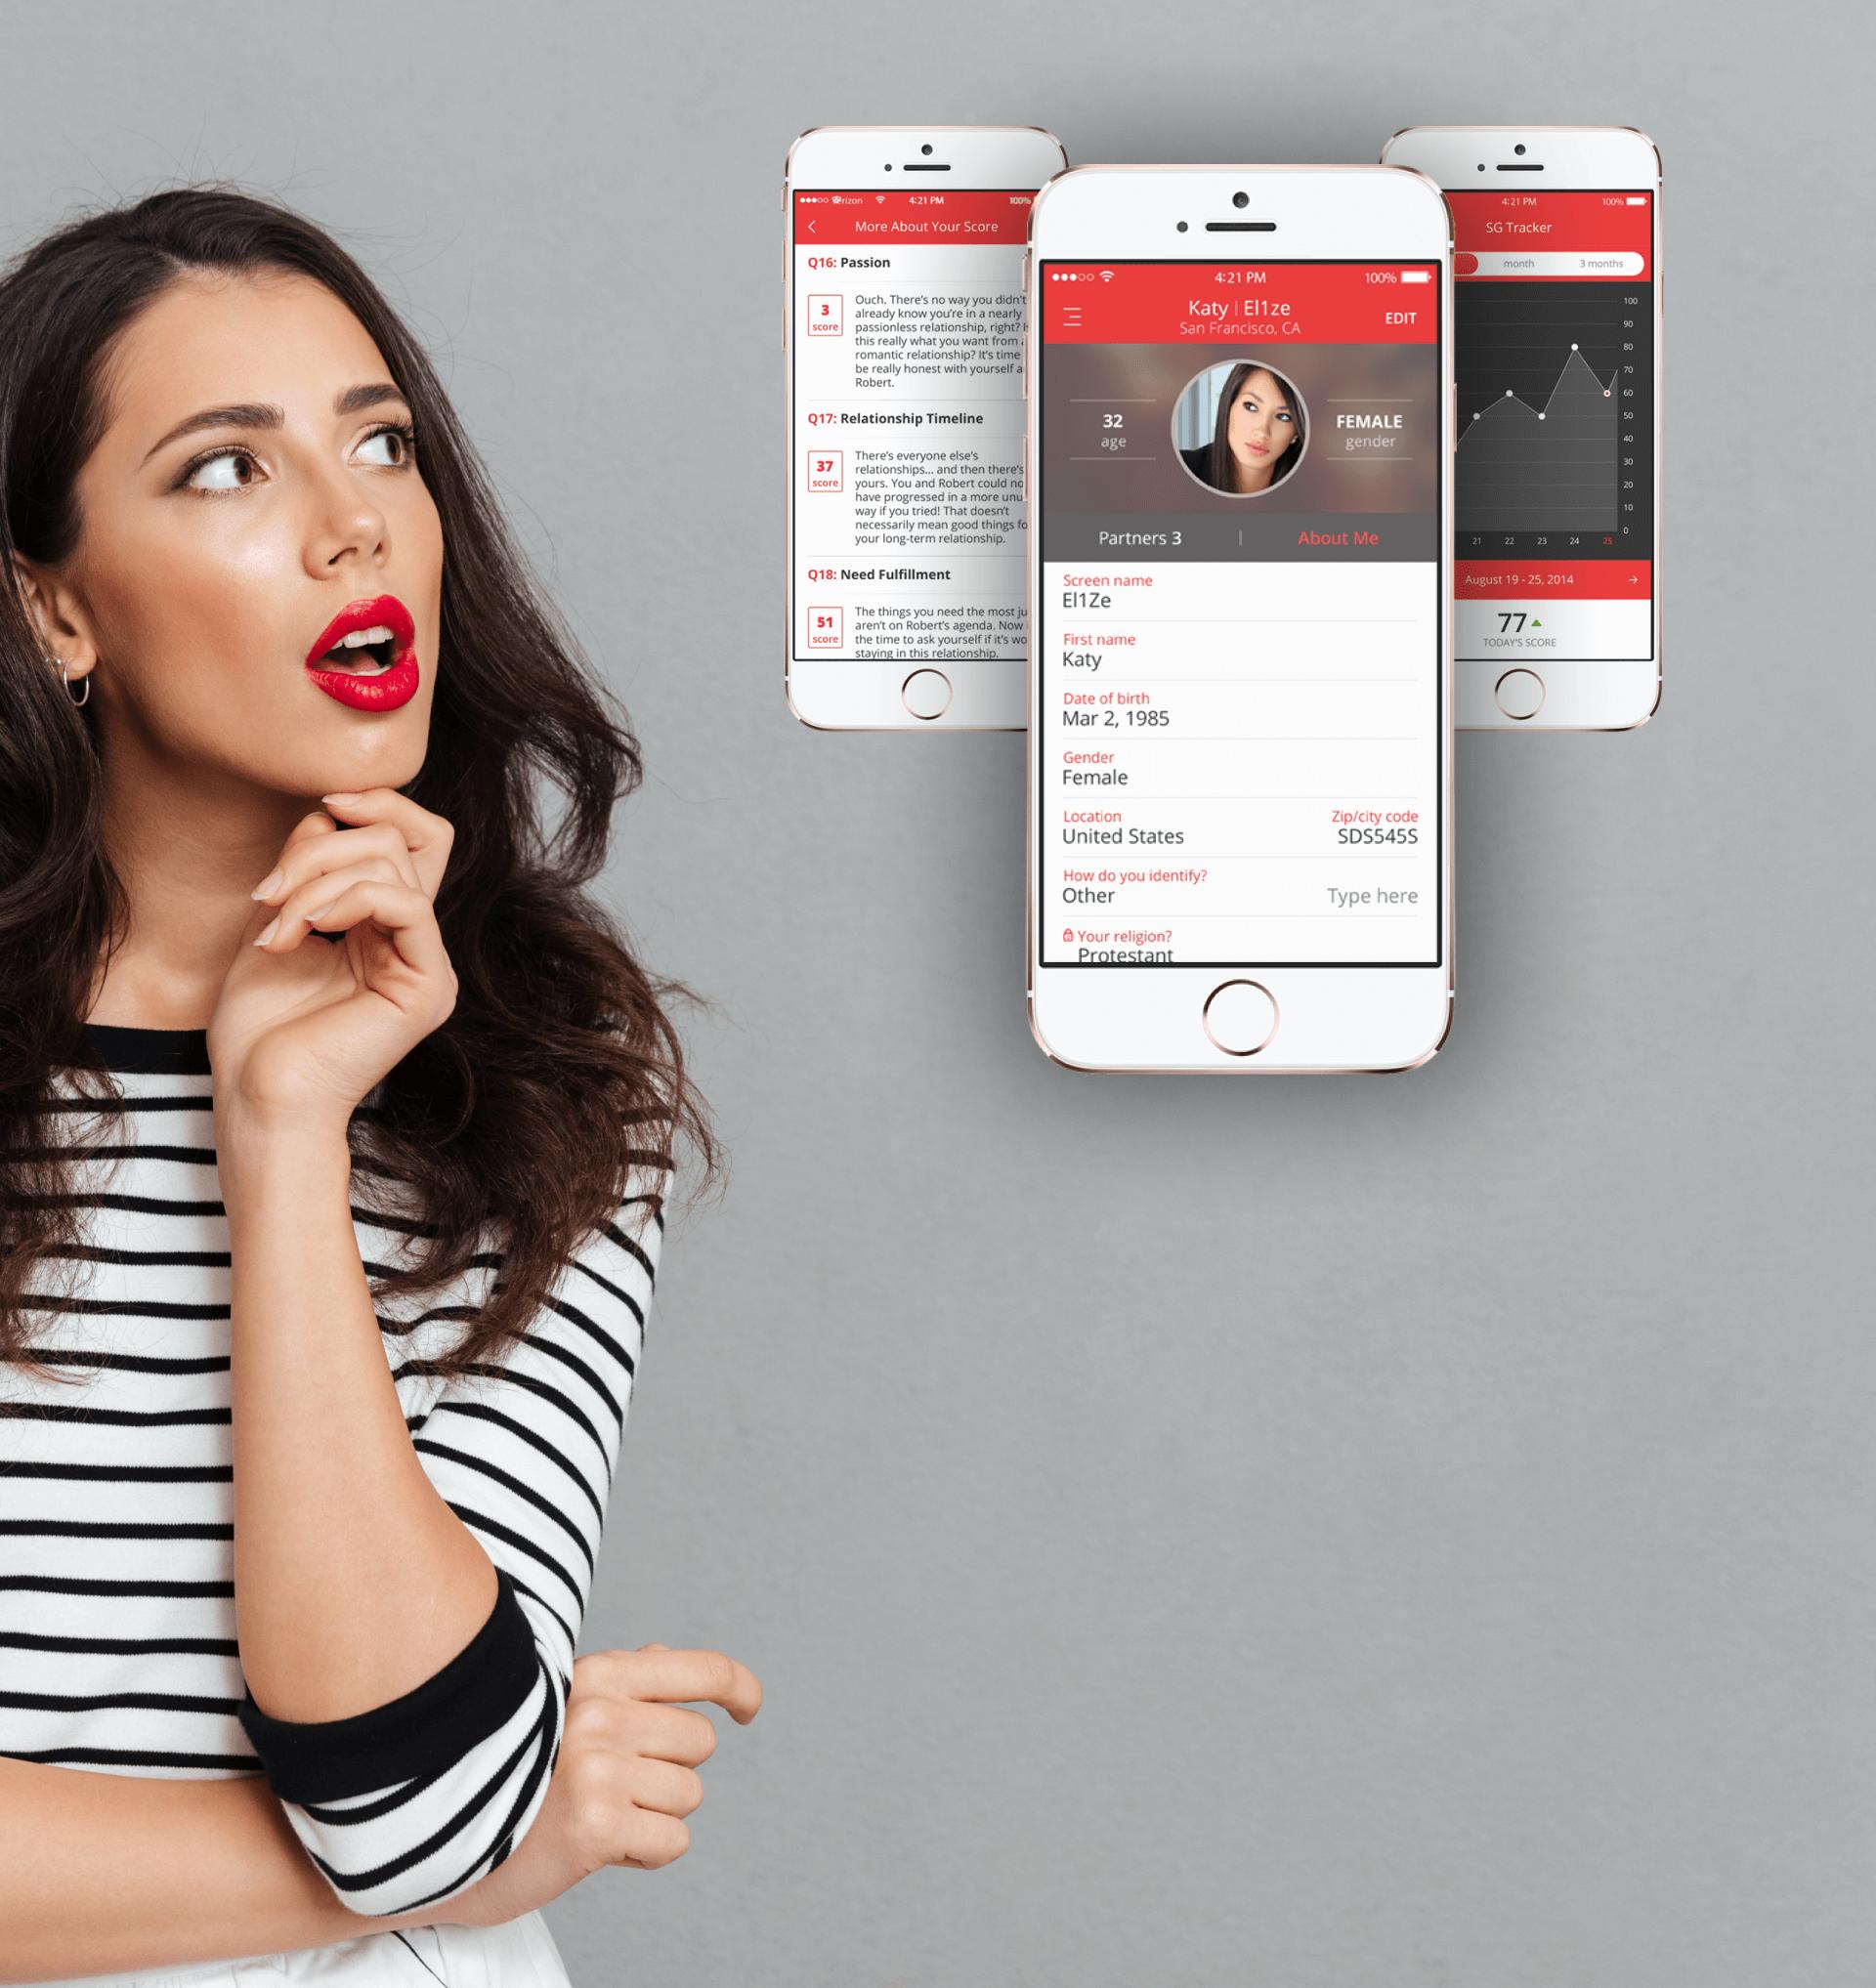 JavaScript, PhoneGap (Cordova) for cross-platform app development